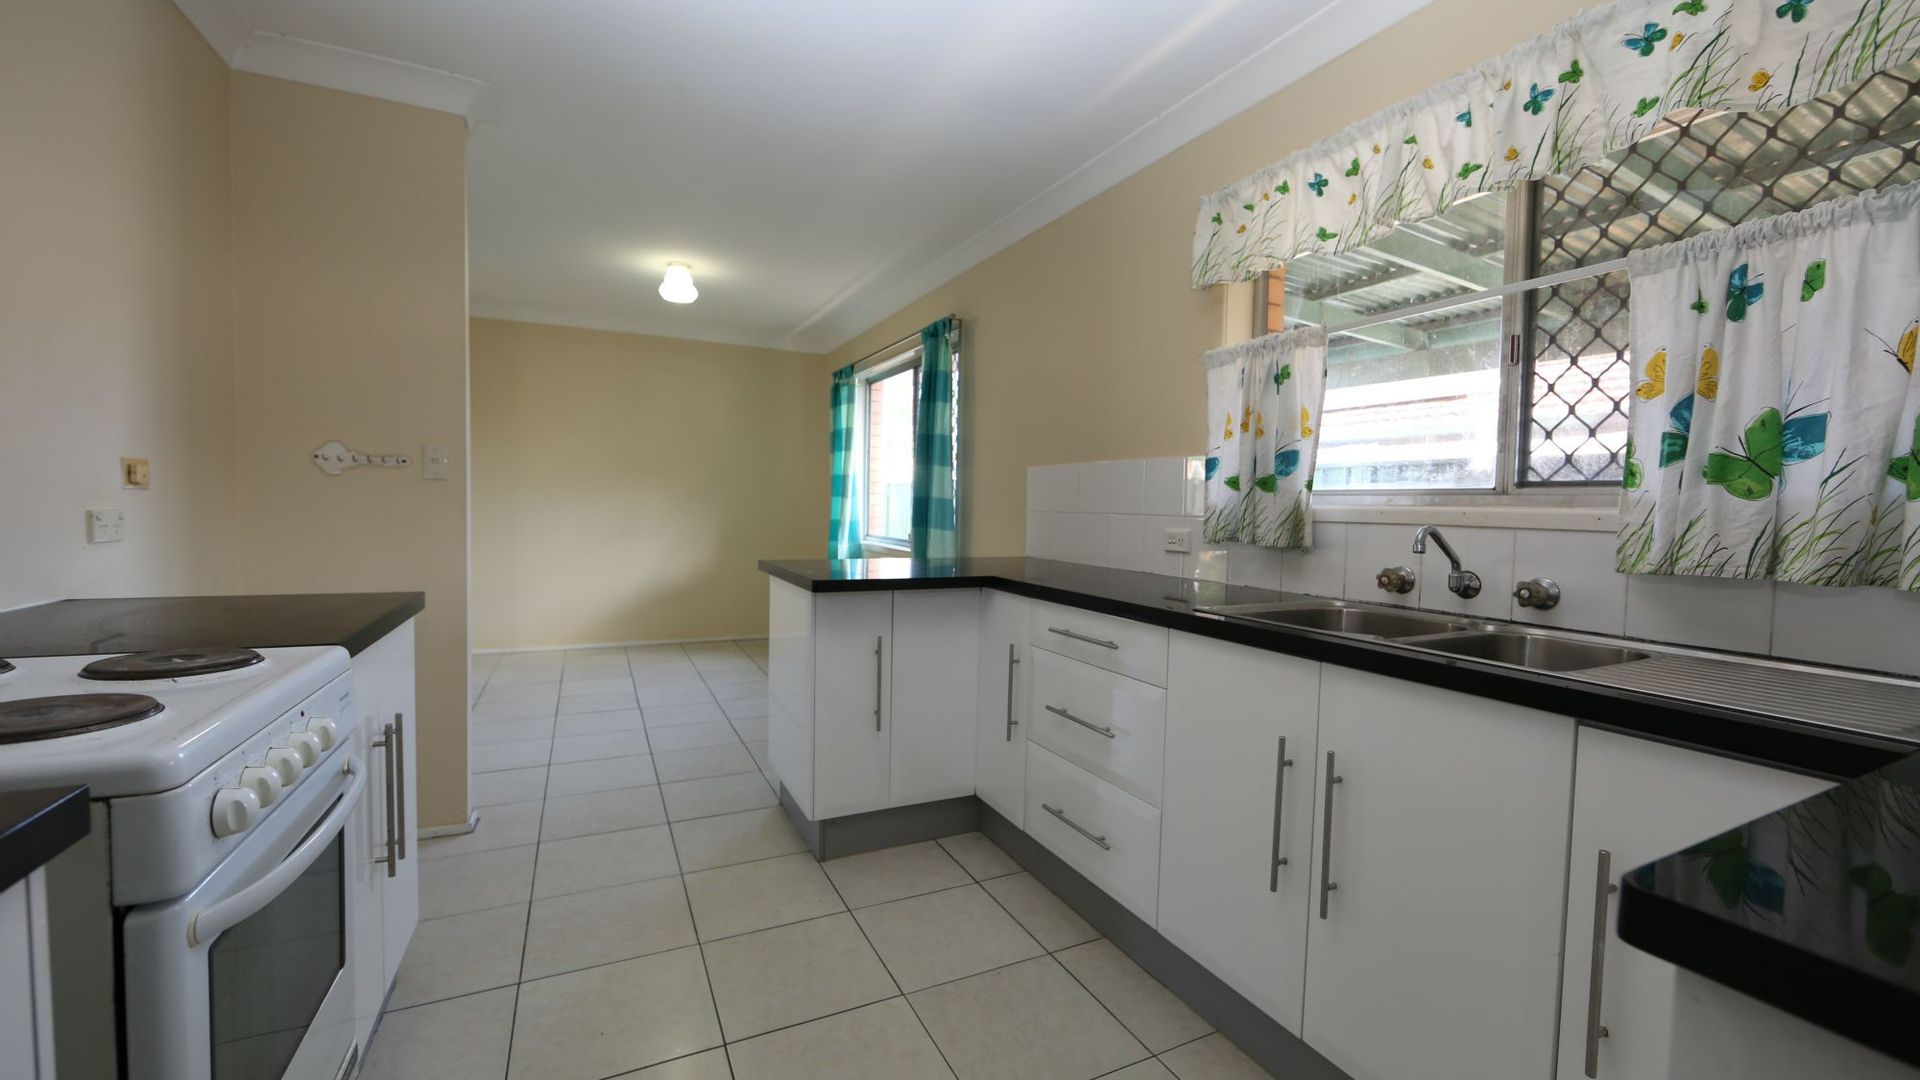 14 Moorgate St, Macgregor QLD 4109, Image 1